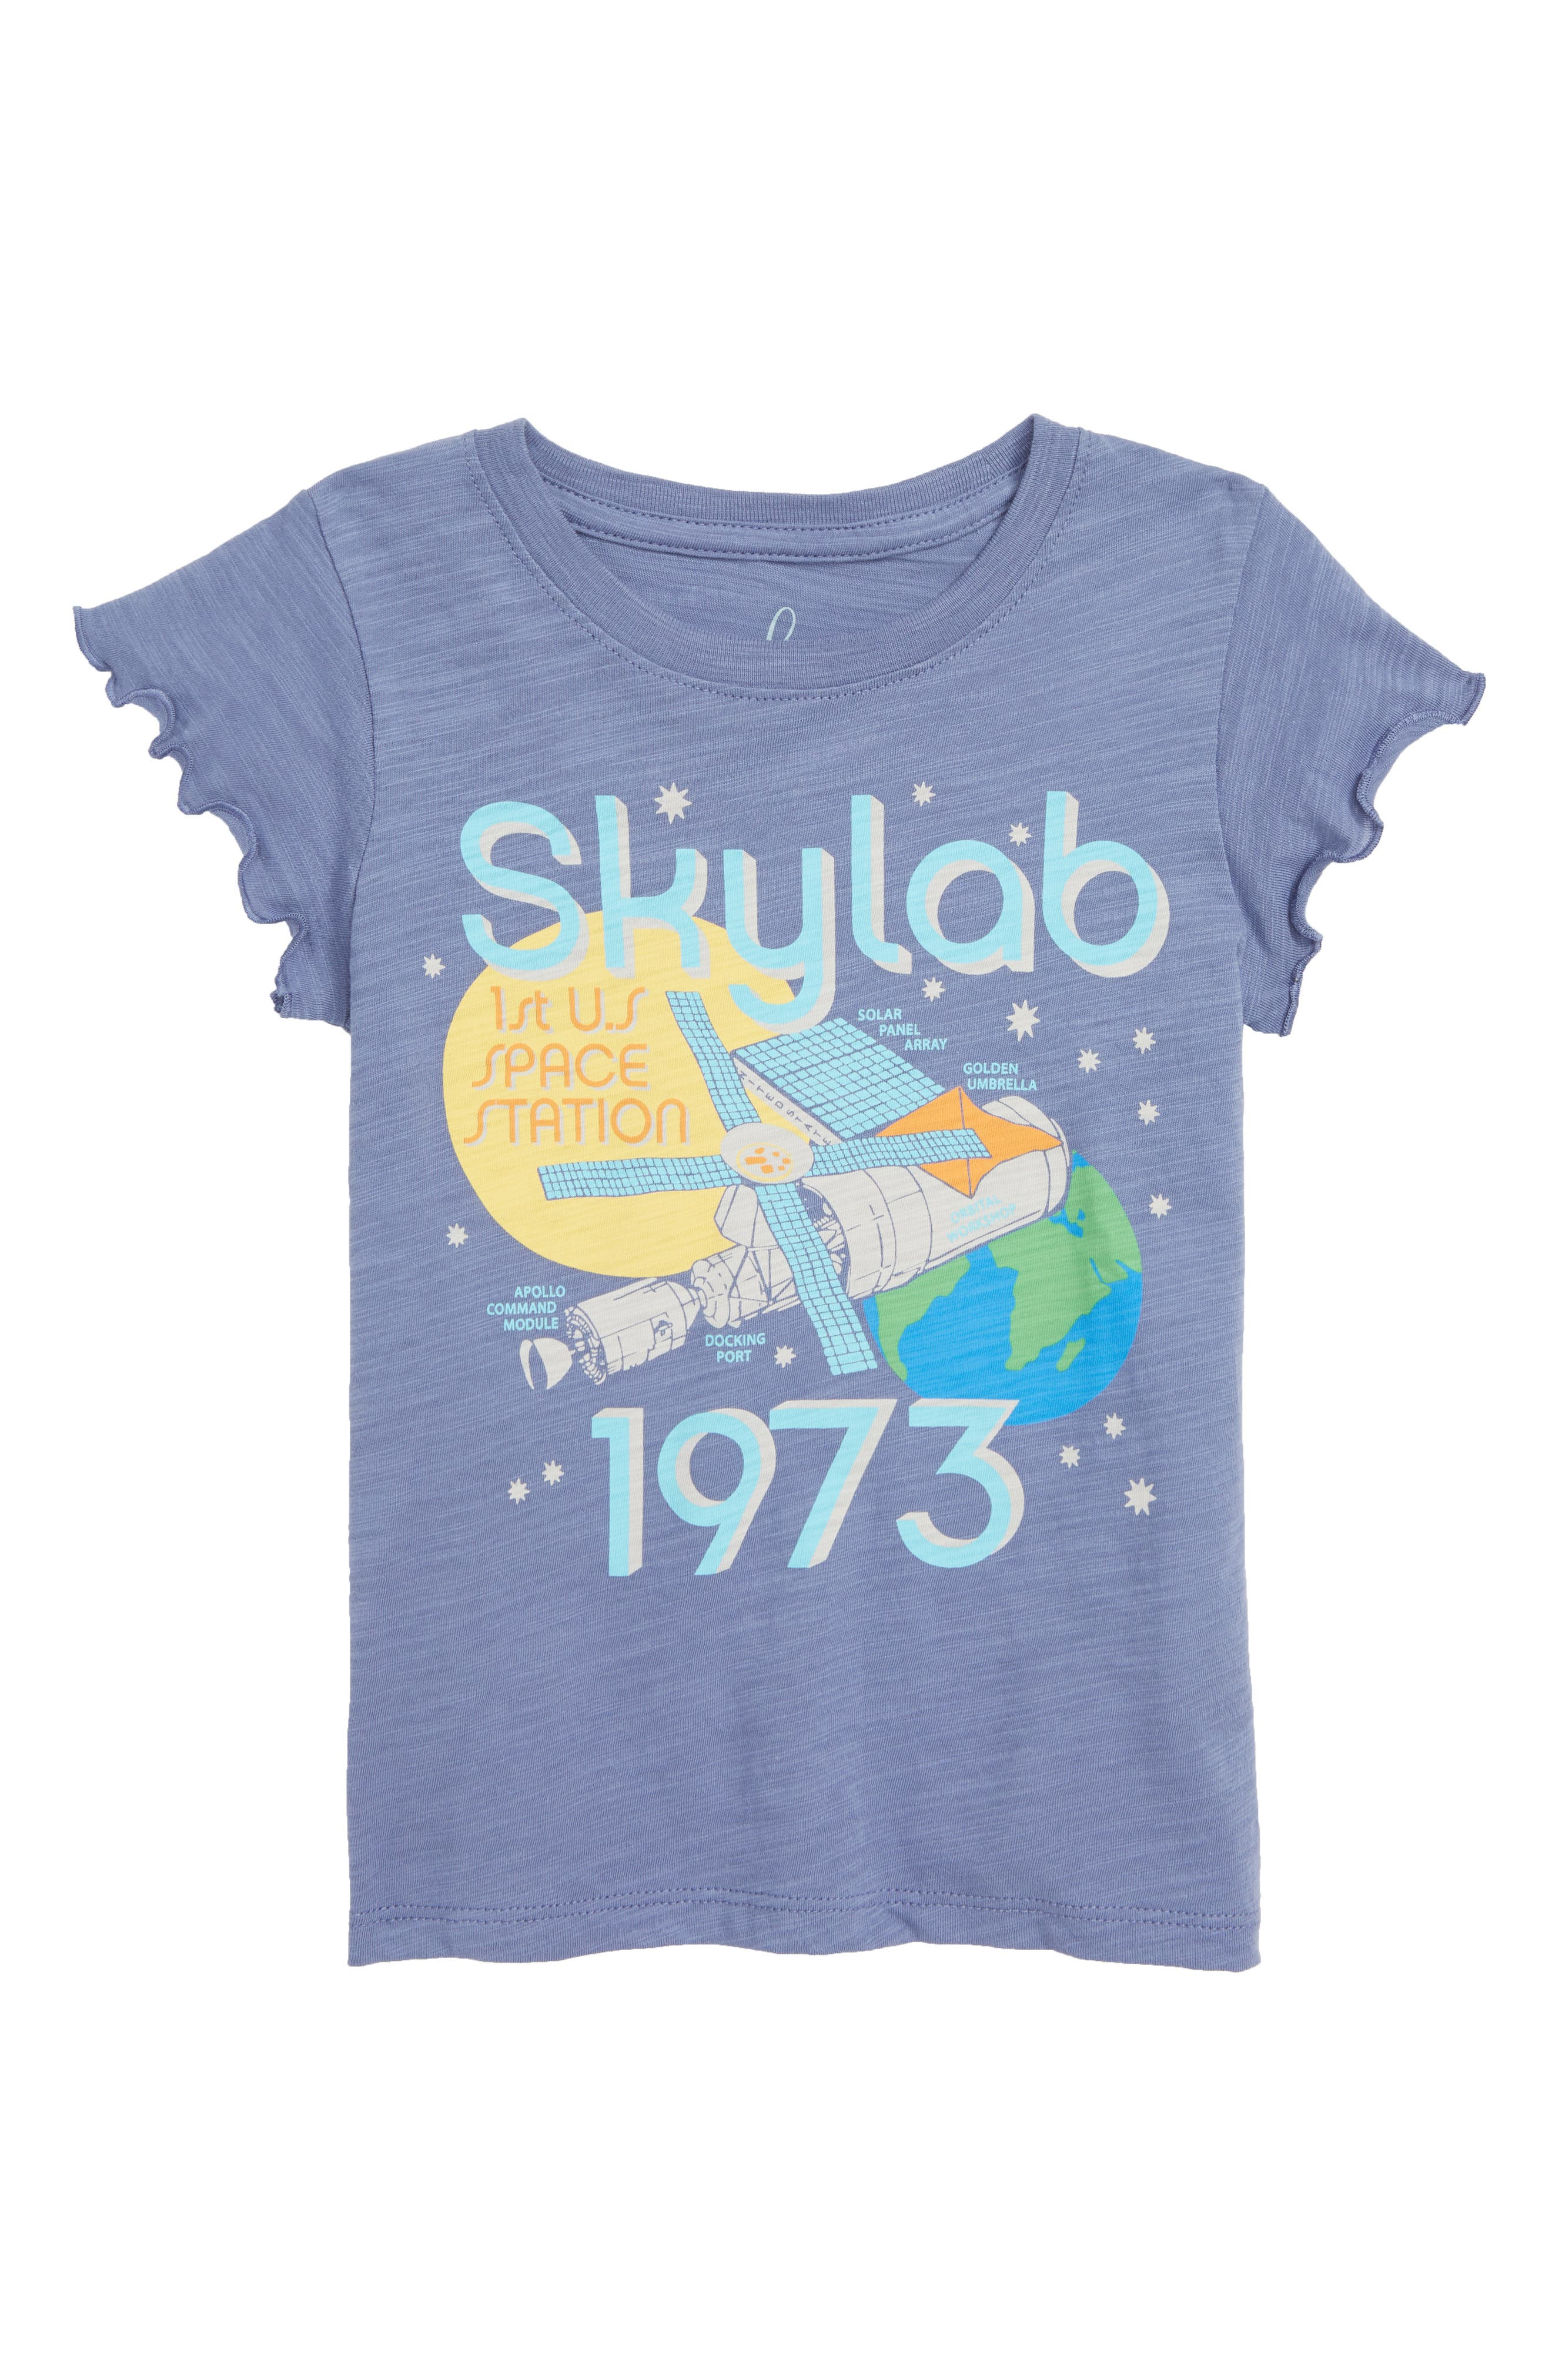 Peek Skylab Tee,                         Main,                         color, 410